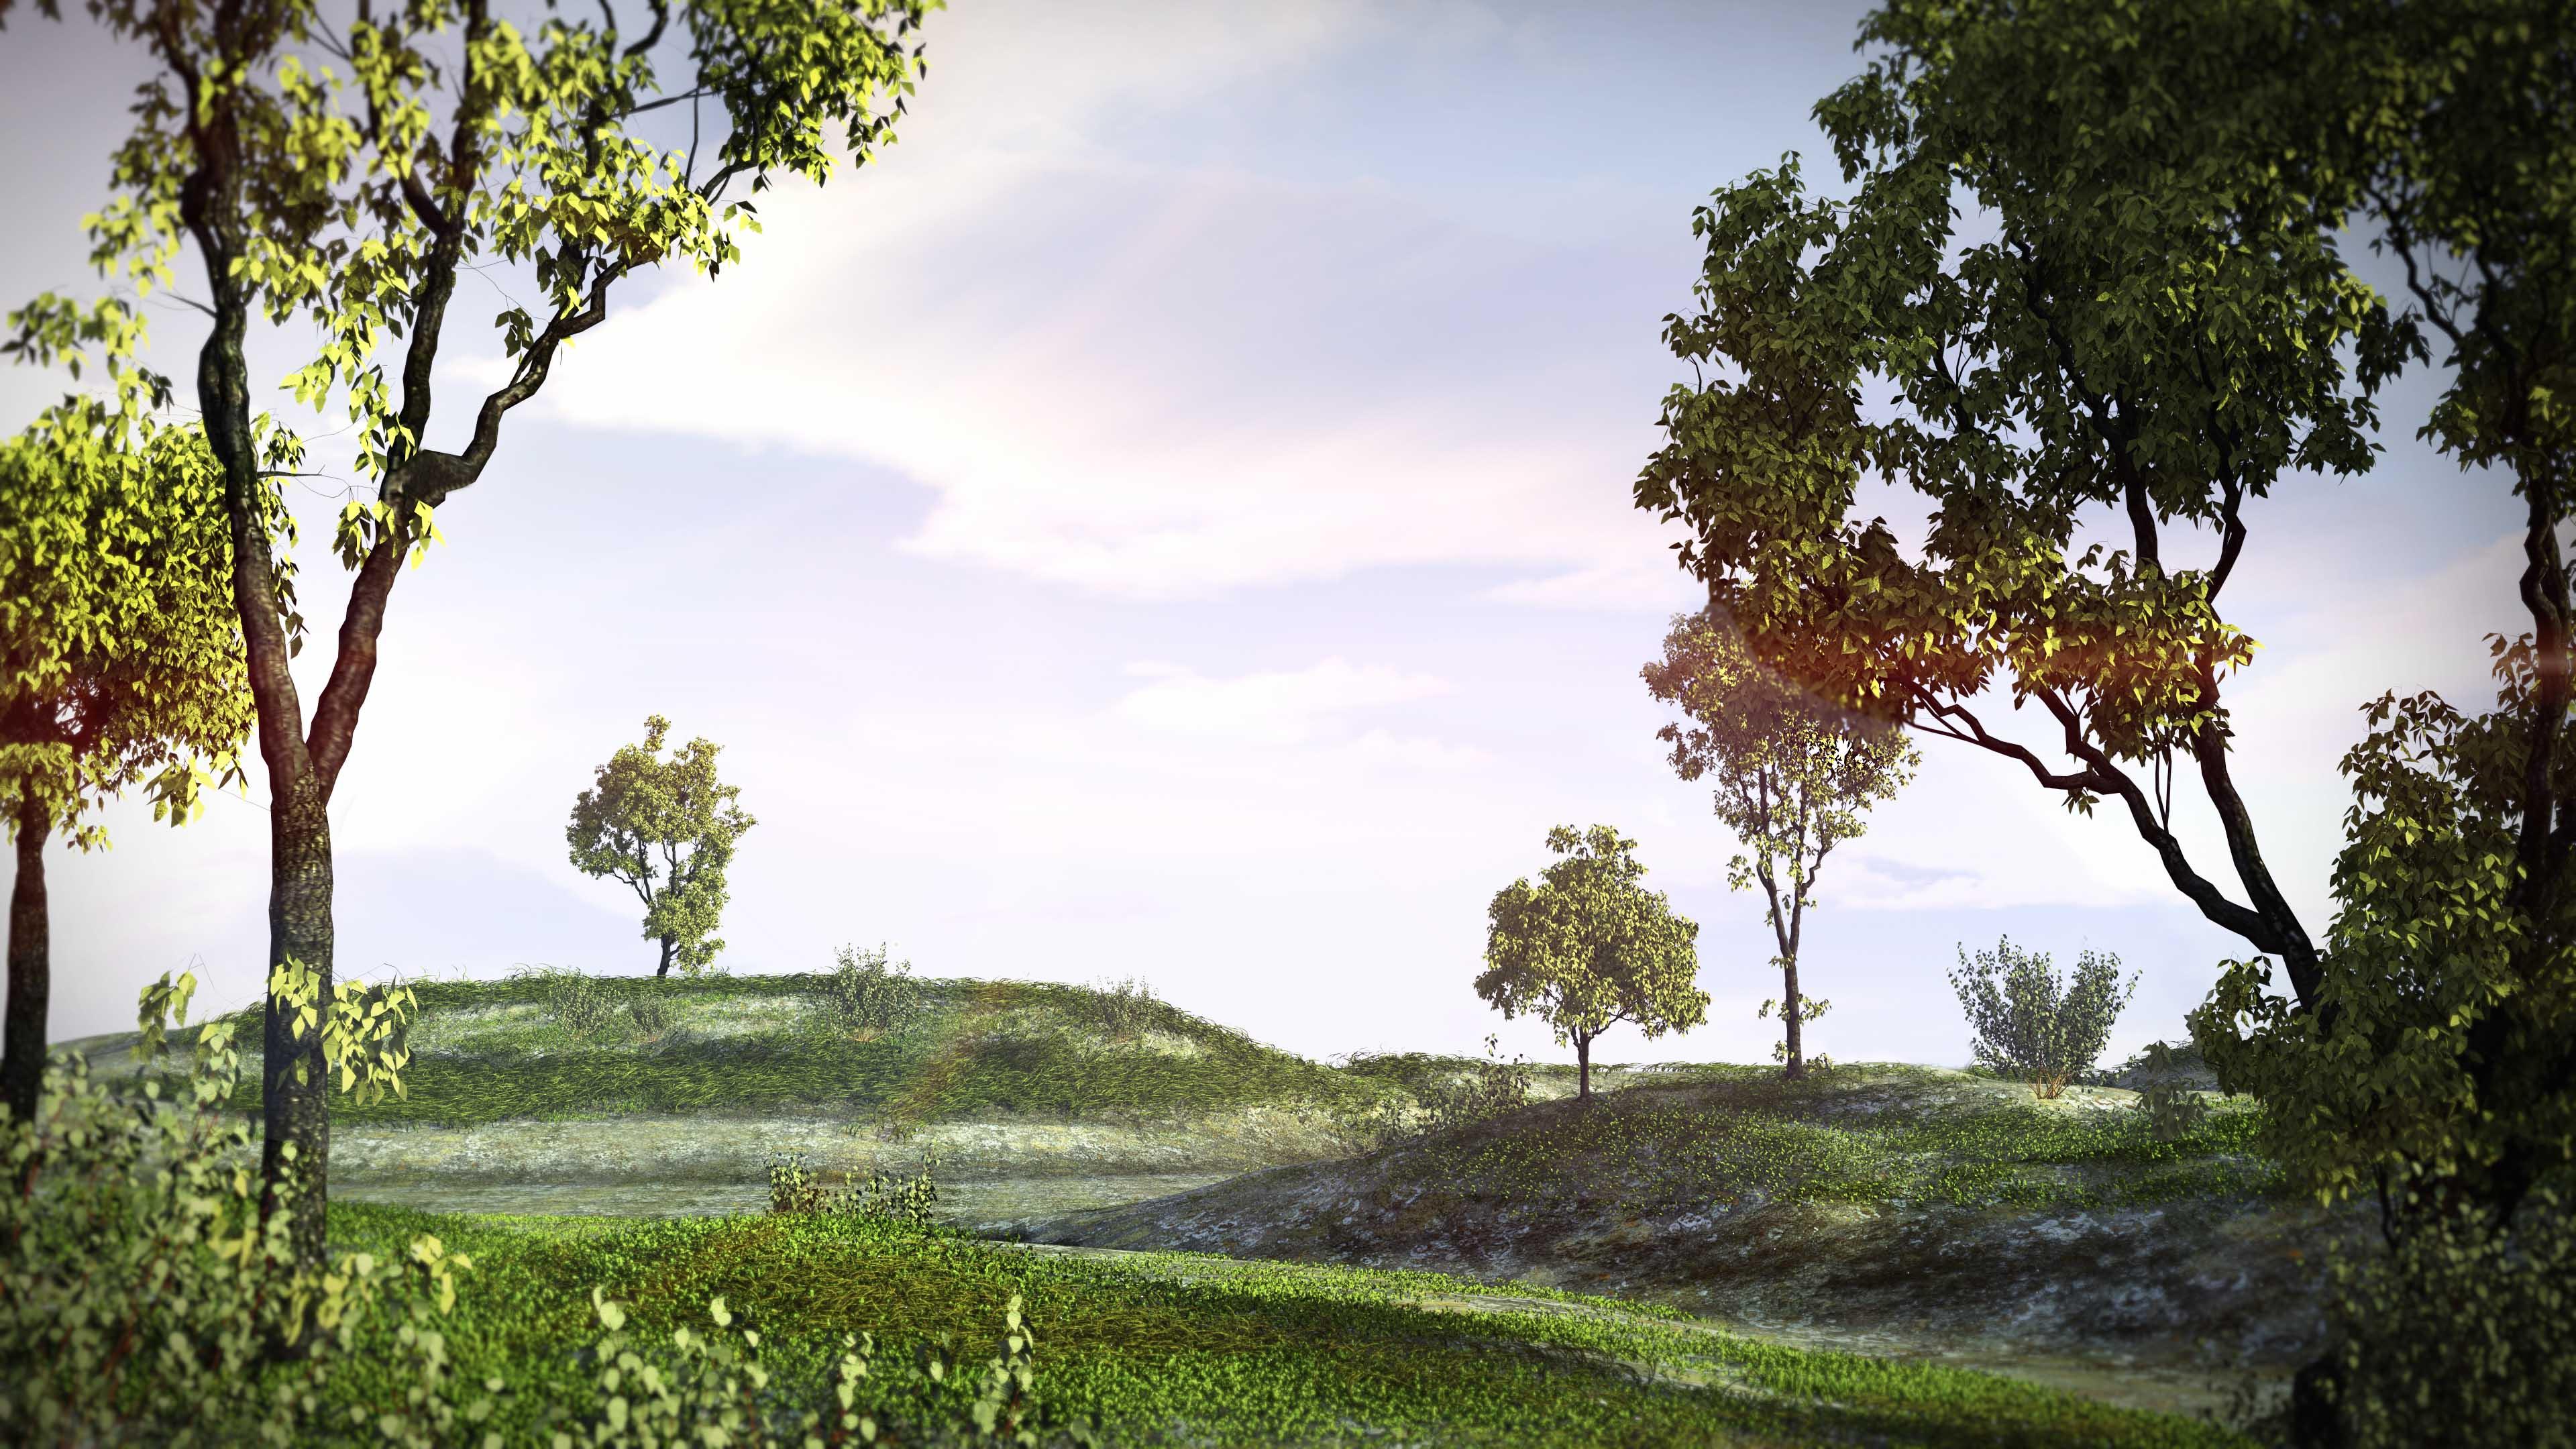 Environment_t5est.jpg